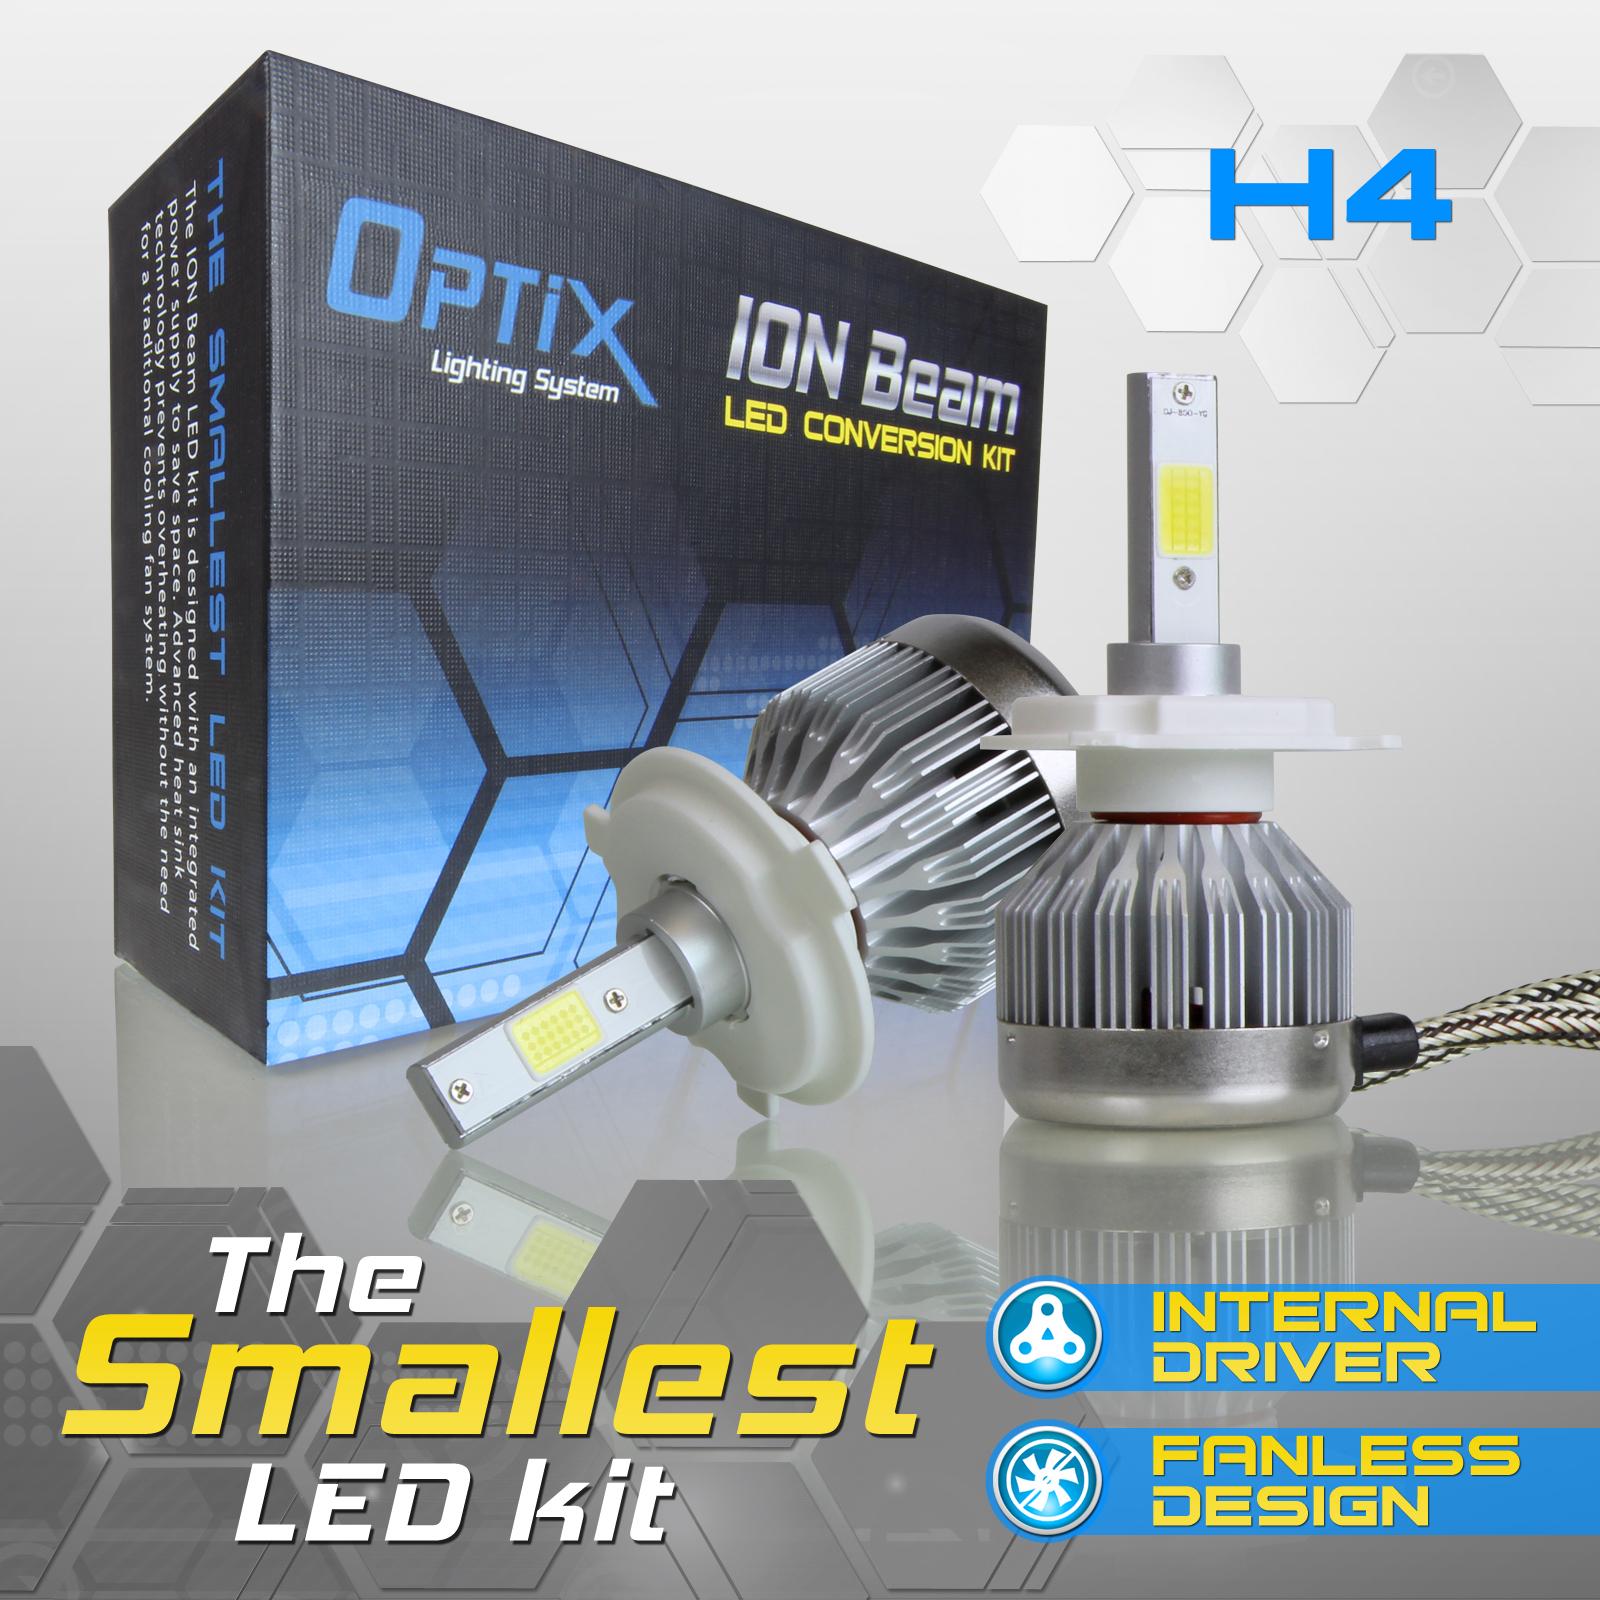 Optix H4 LED Ion Beam Headlight Bulb High/Low Beam Conversion Kit - 6000K White 60W 6000LM - Low Beam, High Beam, or Fog Light